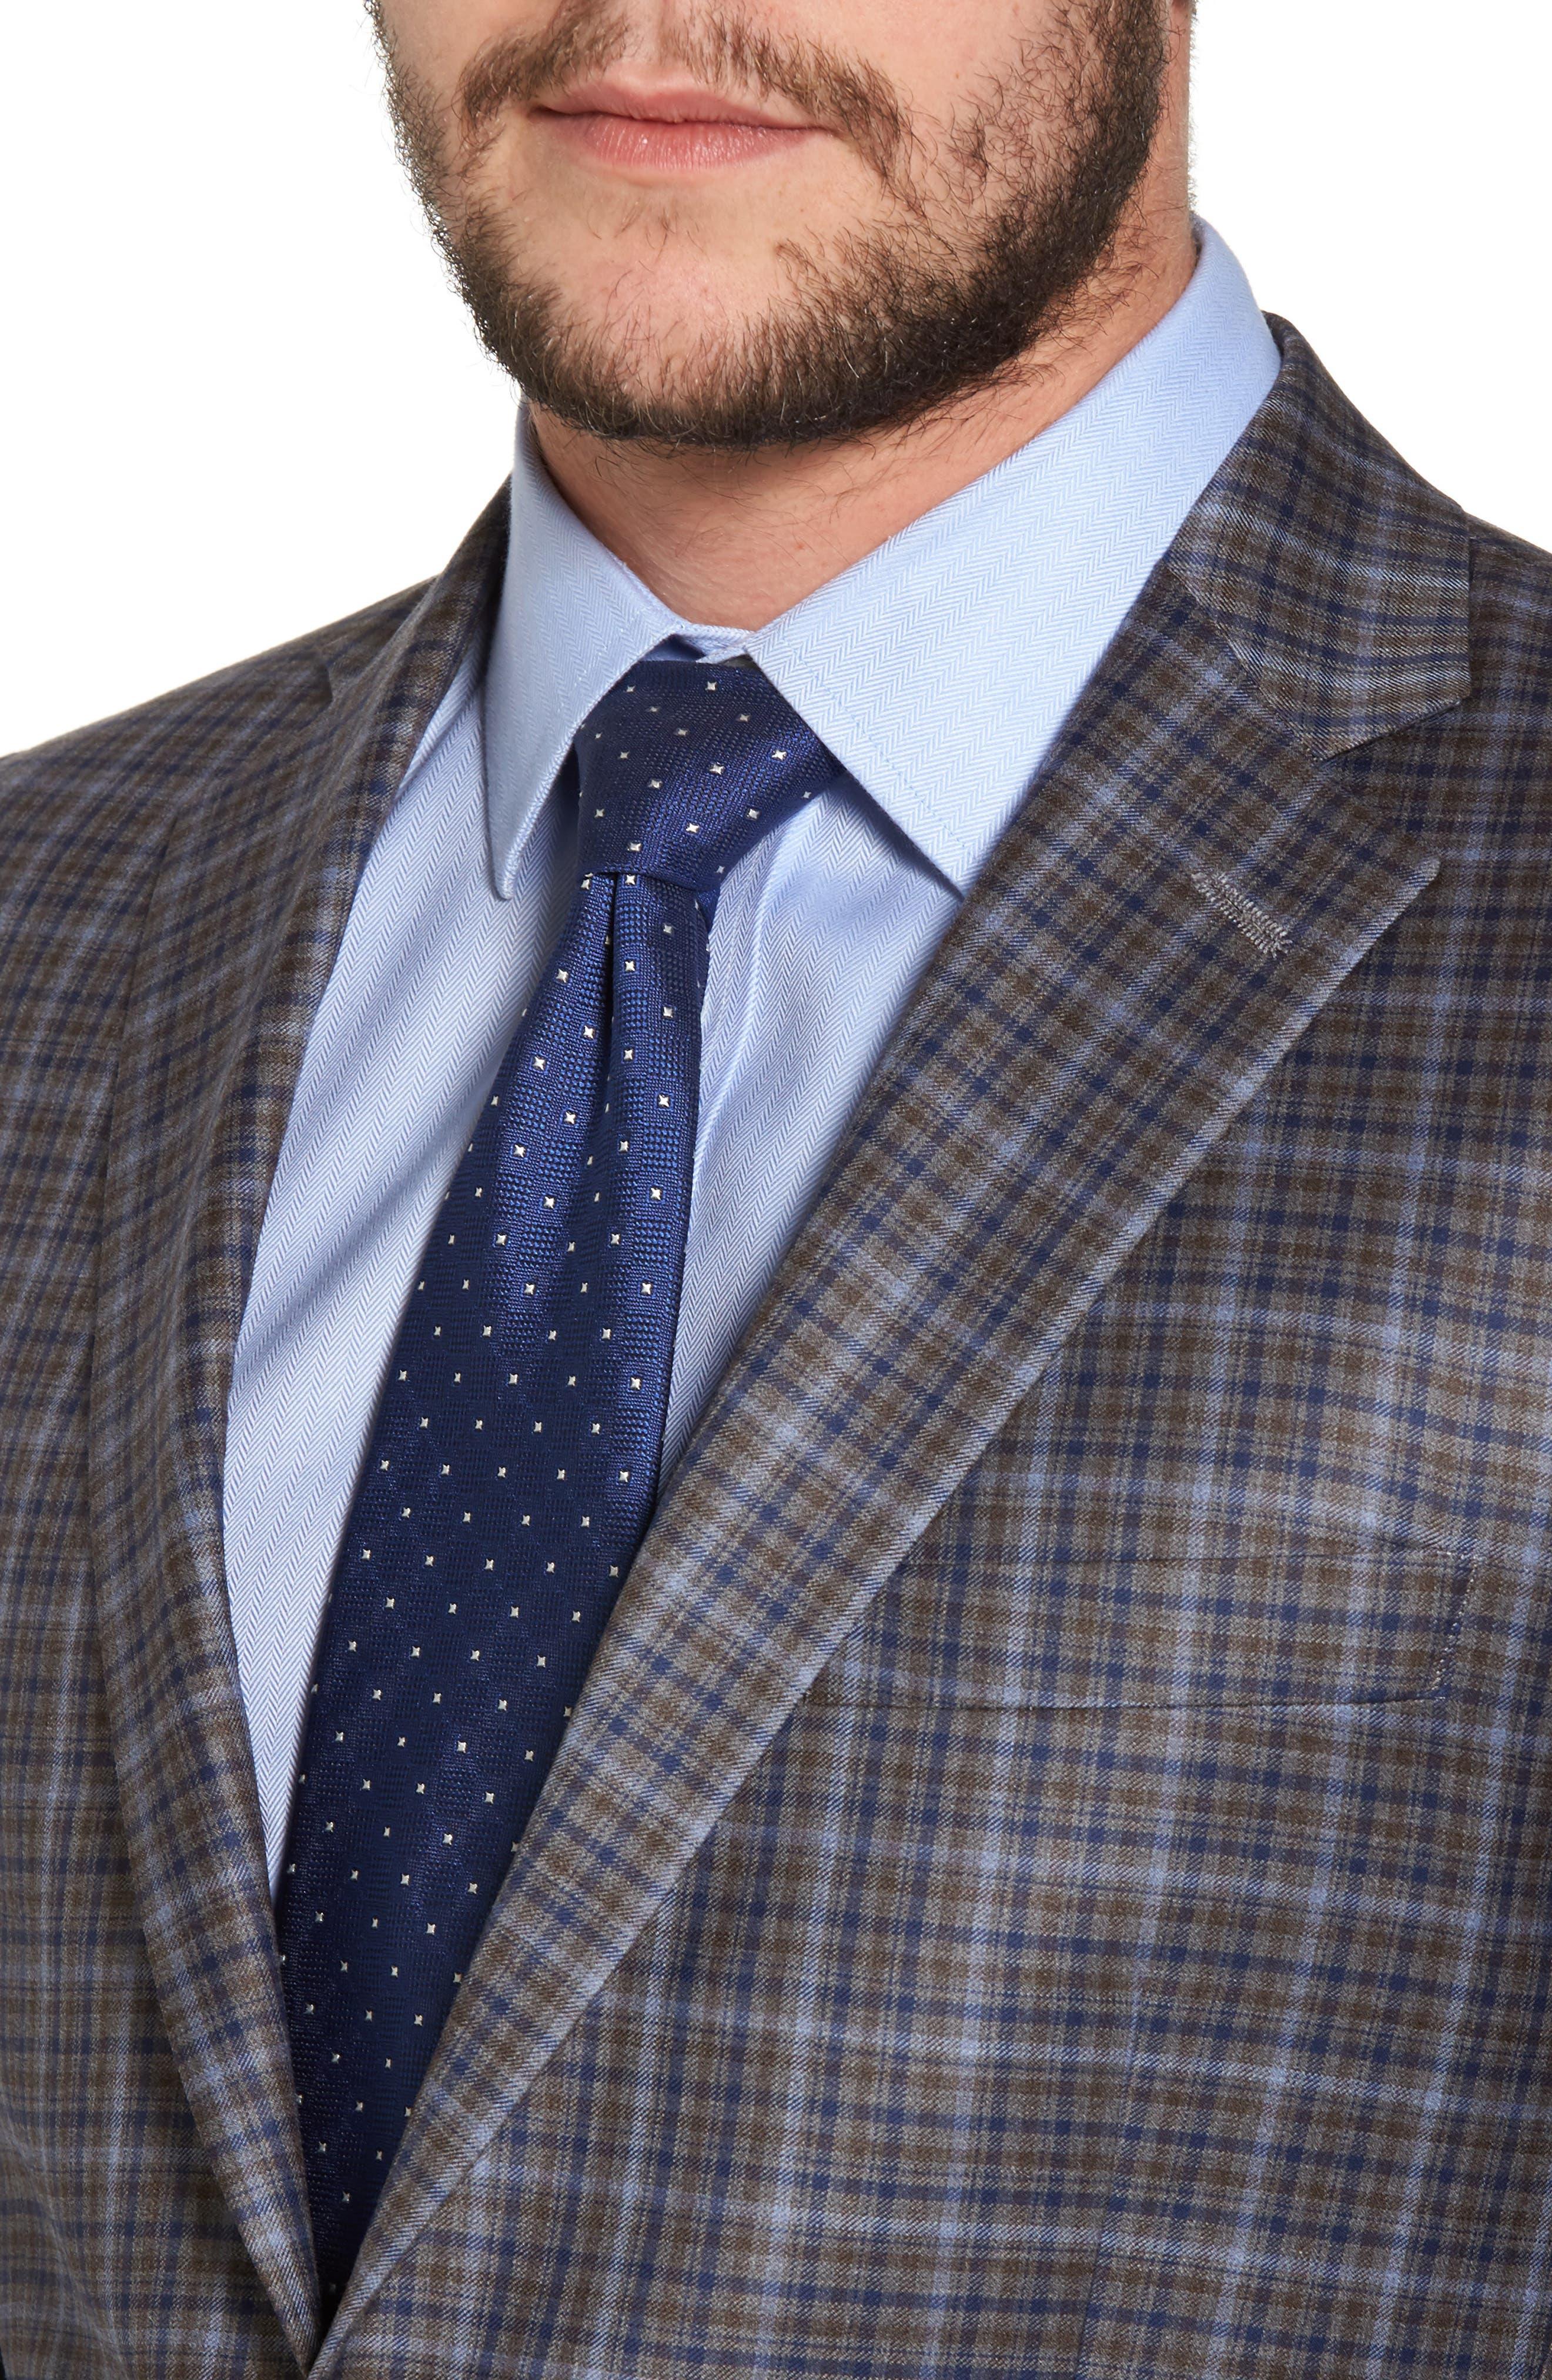 Classic Fit Plaid Wool Sport Coat,                             Alternate thumbnail 4, color,                             280